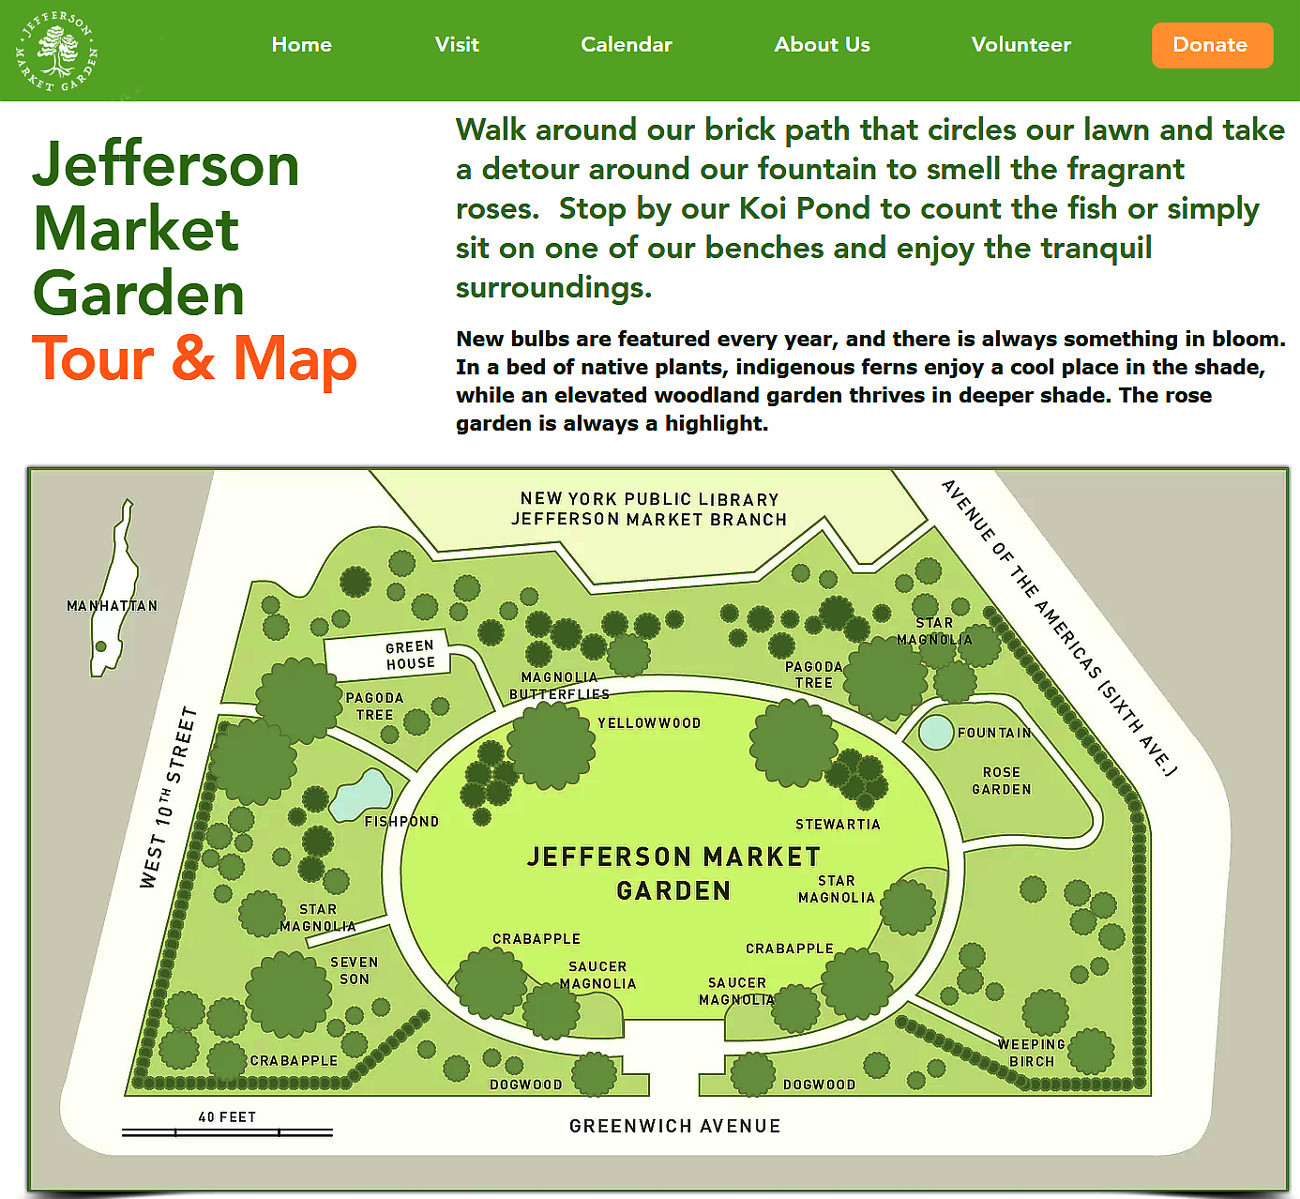 NYグリニッジ・ビレッジの隠れ家的ガーデン、Jefferson Market Garden_b0007805_02362624.jpg